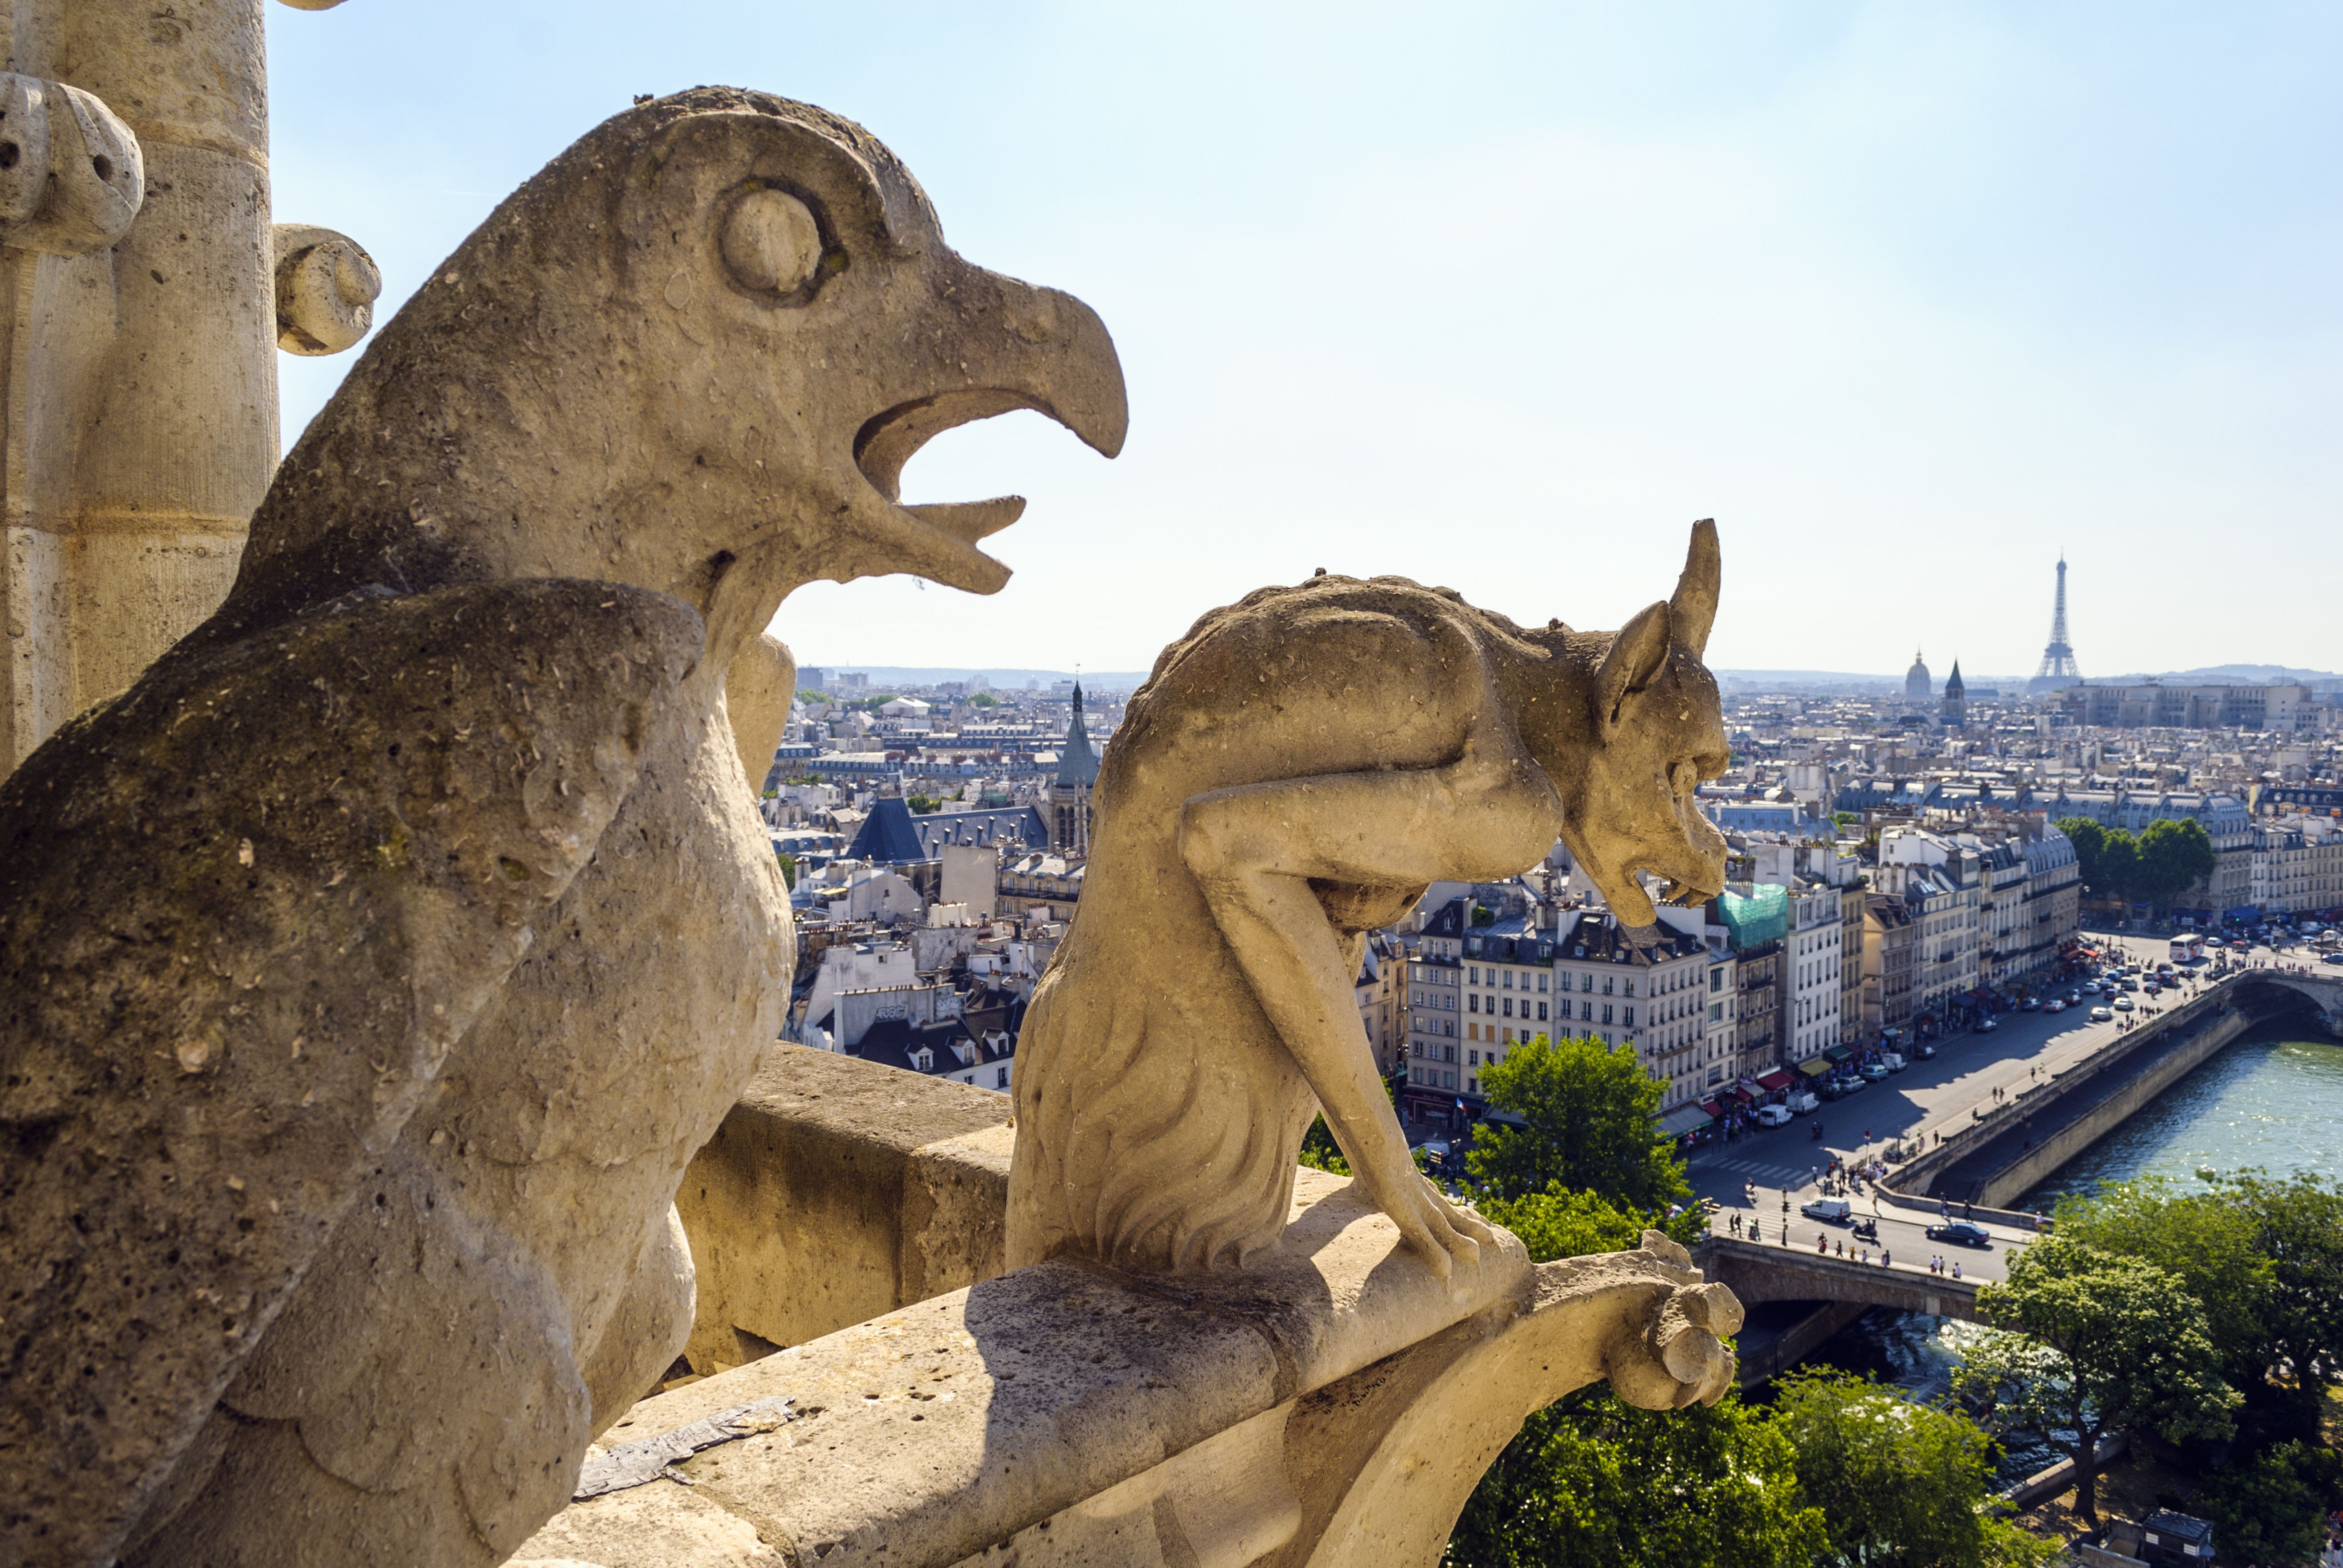 Gargoyles on roof of Notre Dame, Paris, France